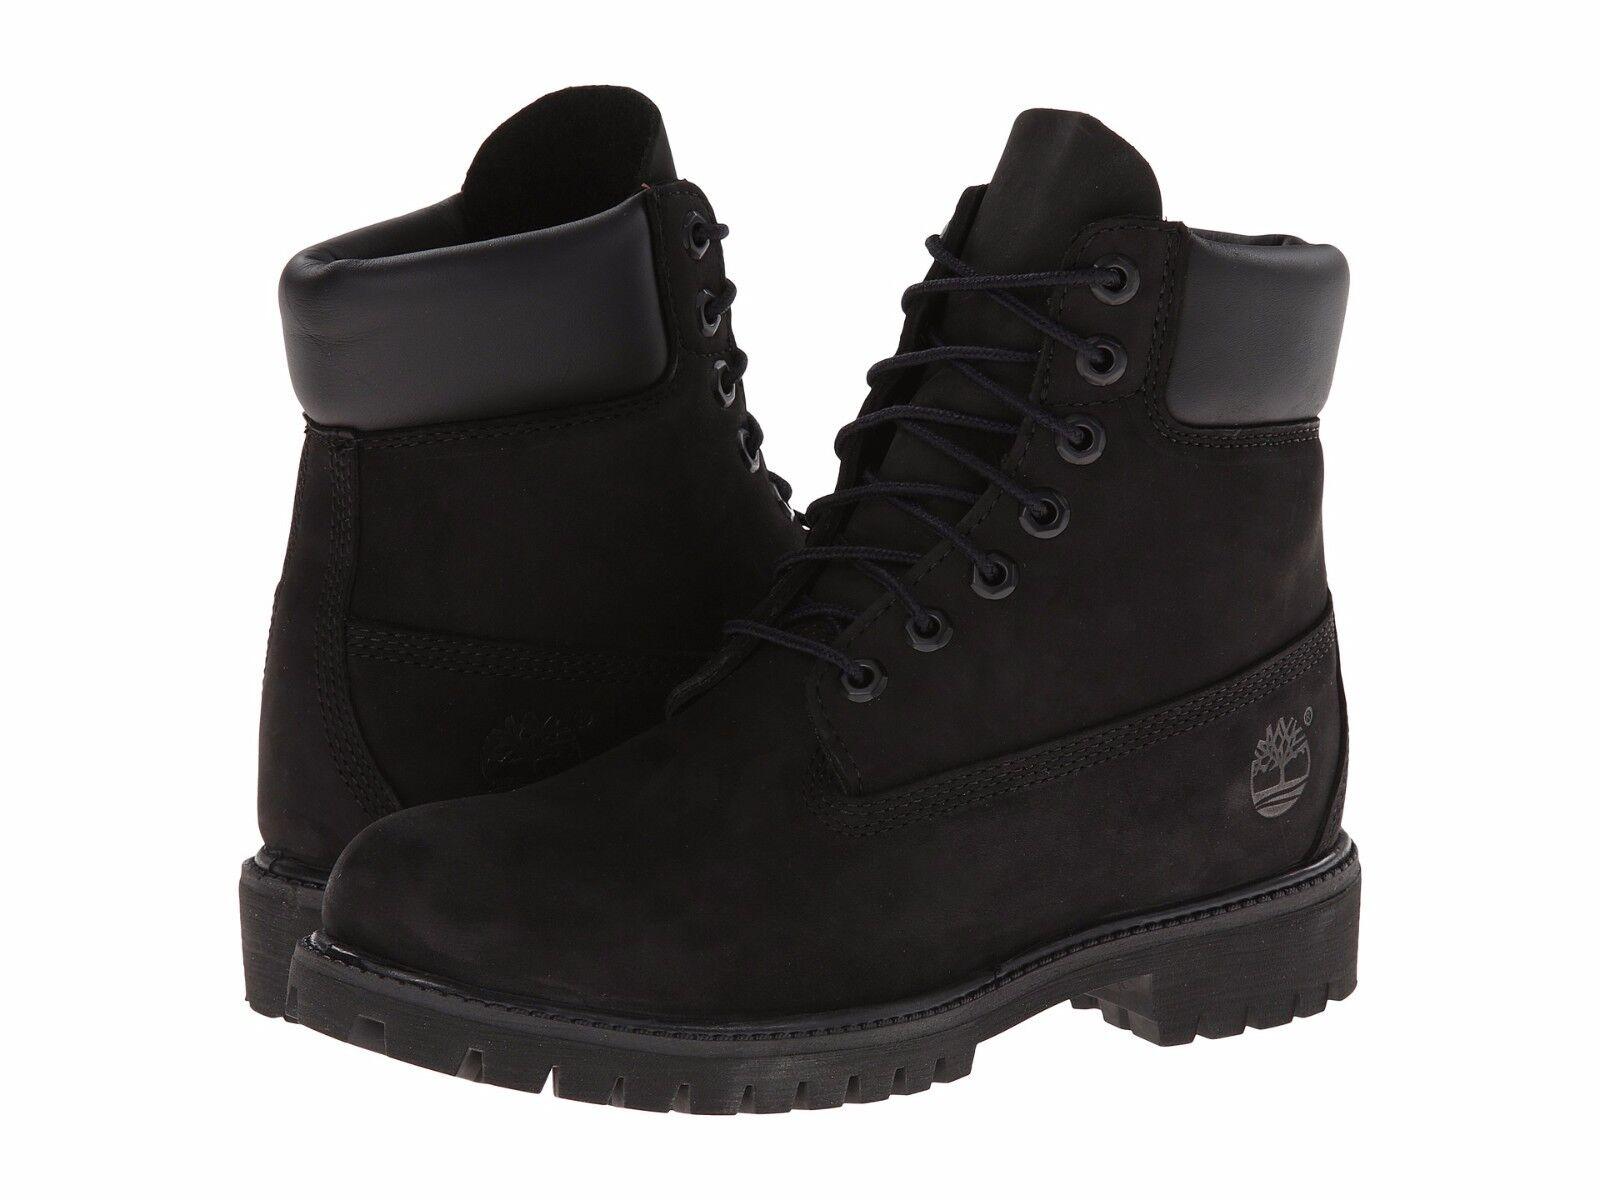 Women's Shoes Timberland 6 INCH PREMIUM Waterproof Lace Up B